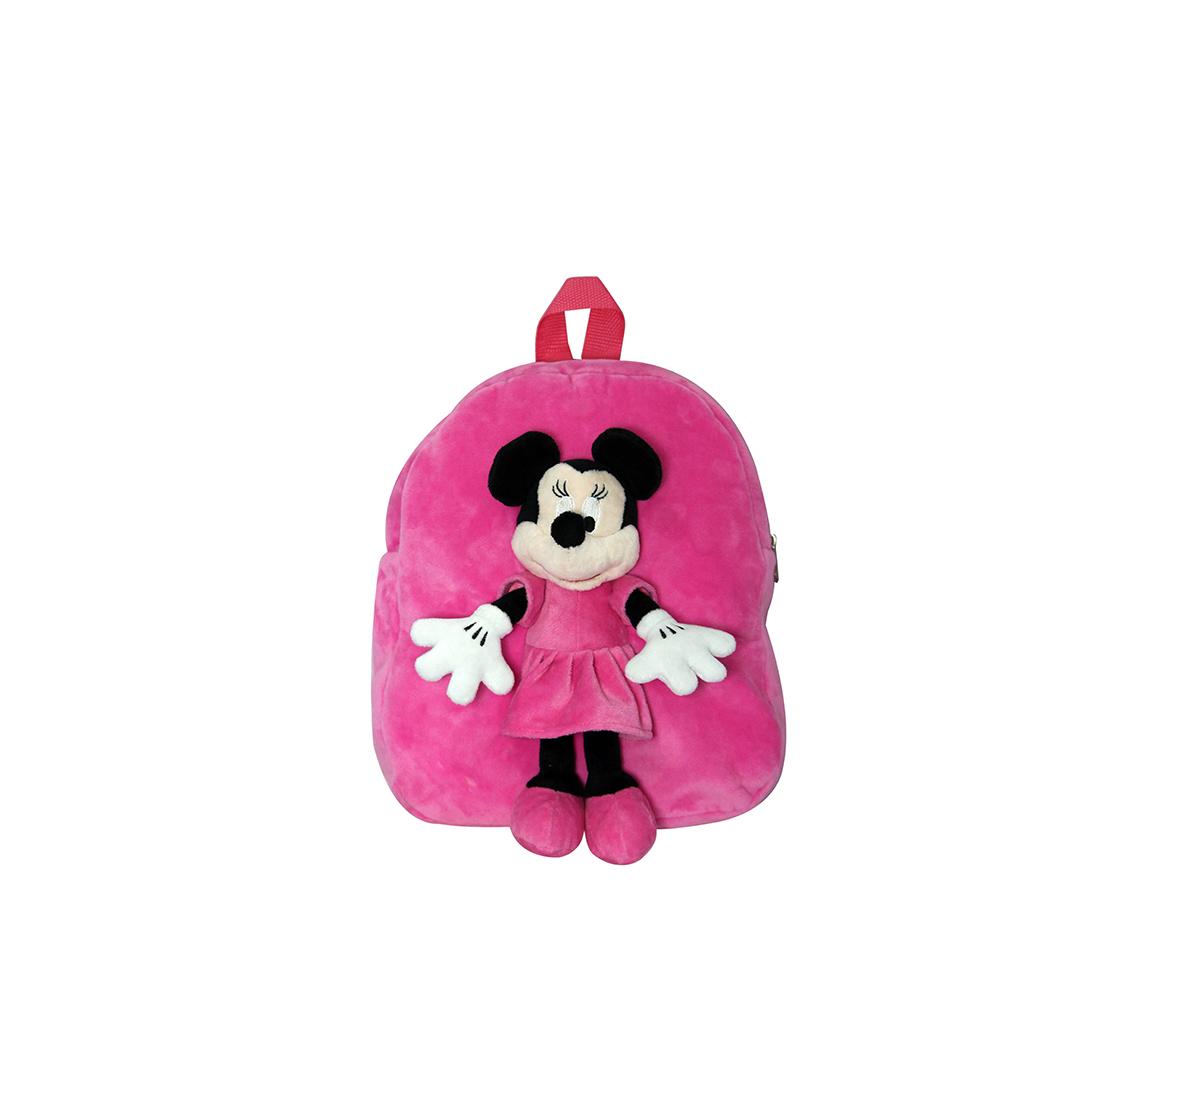 Disney | Disney Minnie Backpack Plush Accessories for Kids age 12M+ - 30.48 Cm